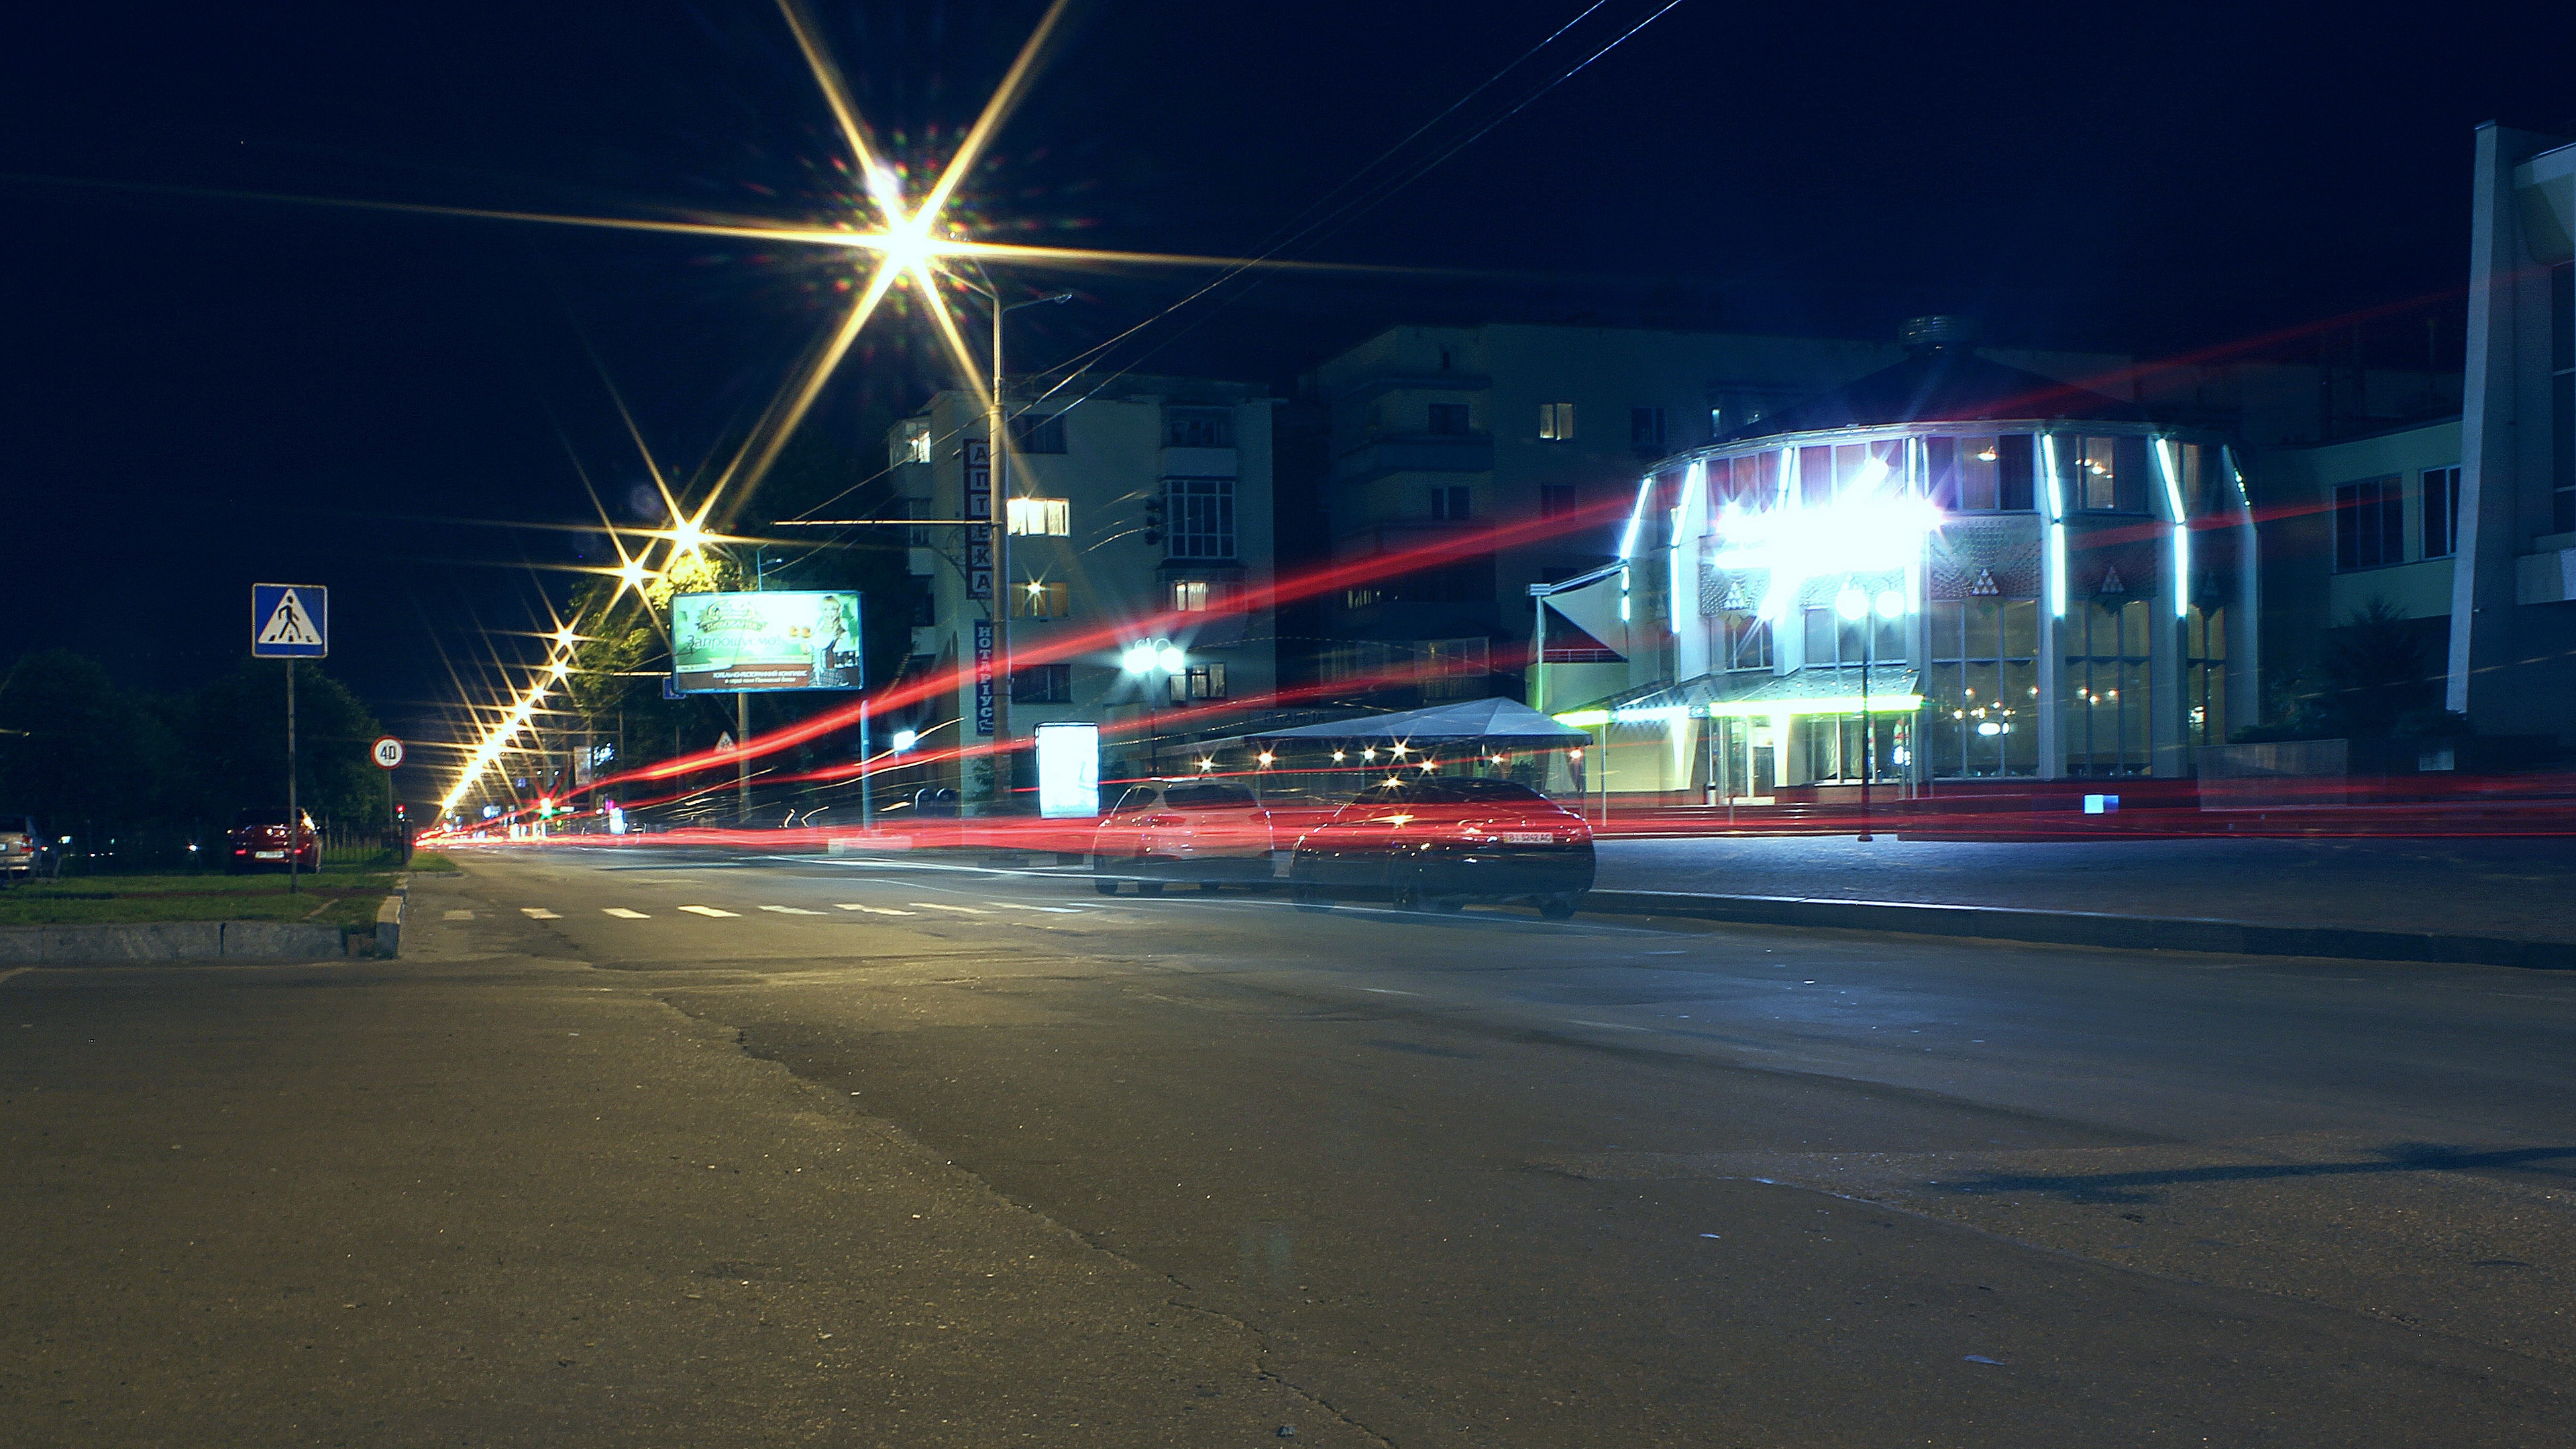 city night cars light 4k 1538065398 - city, night, cars, light 4k - Night, City, Cars